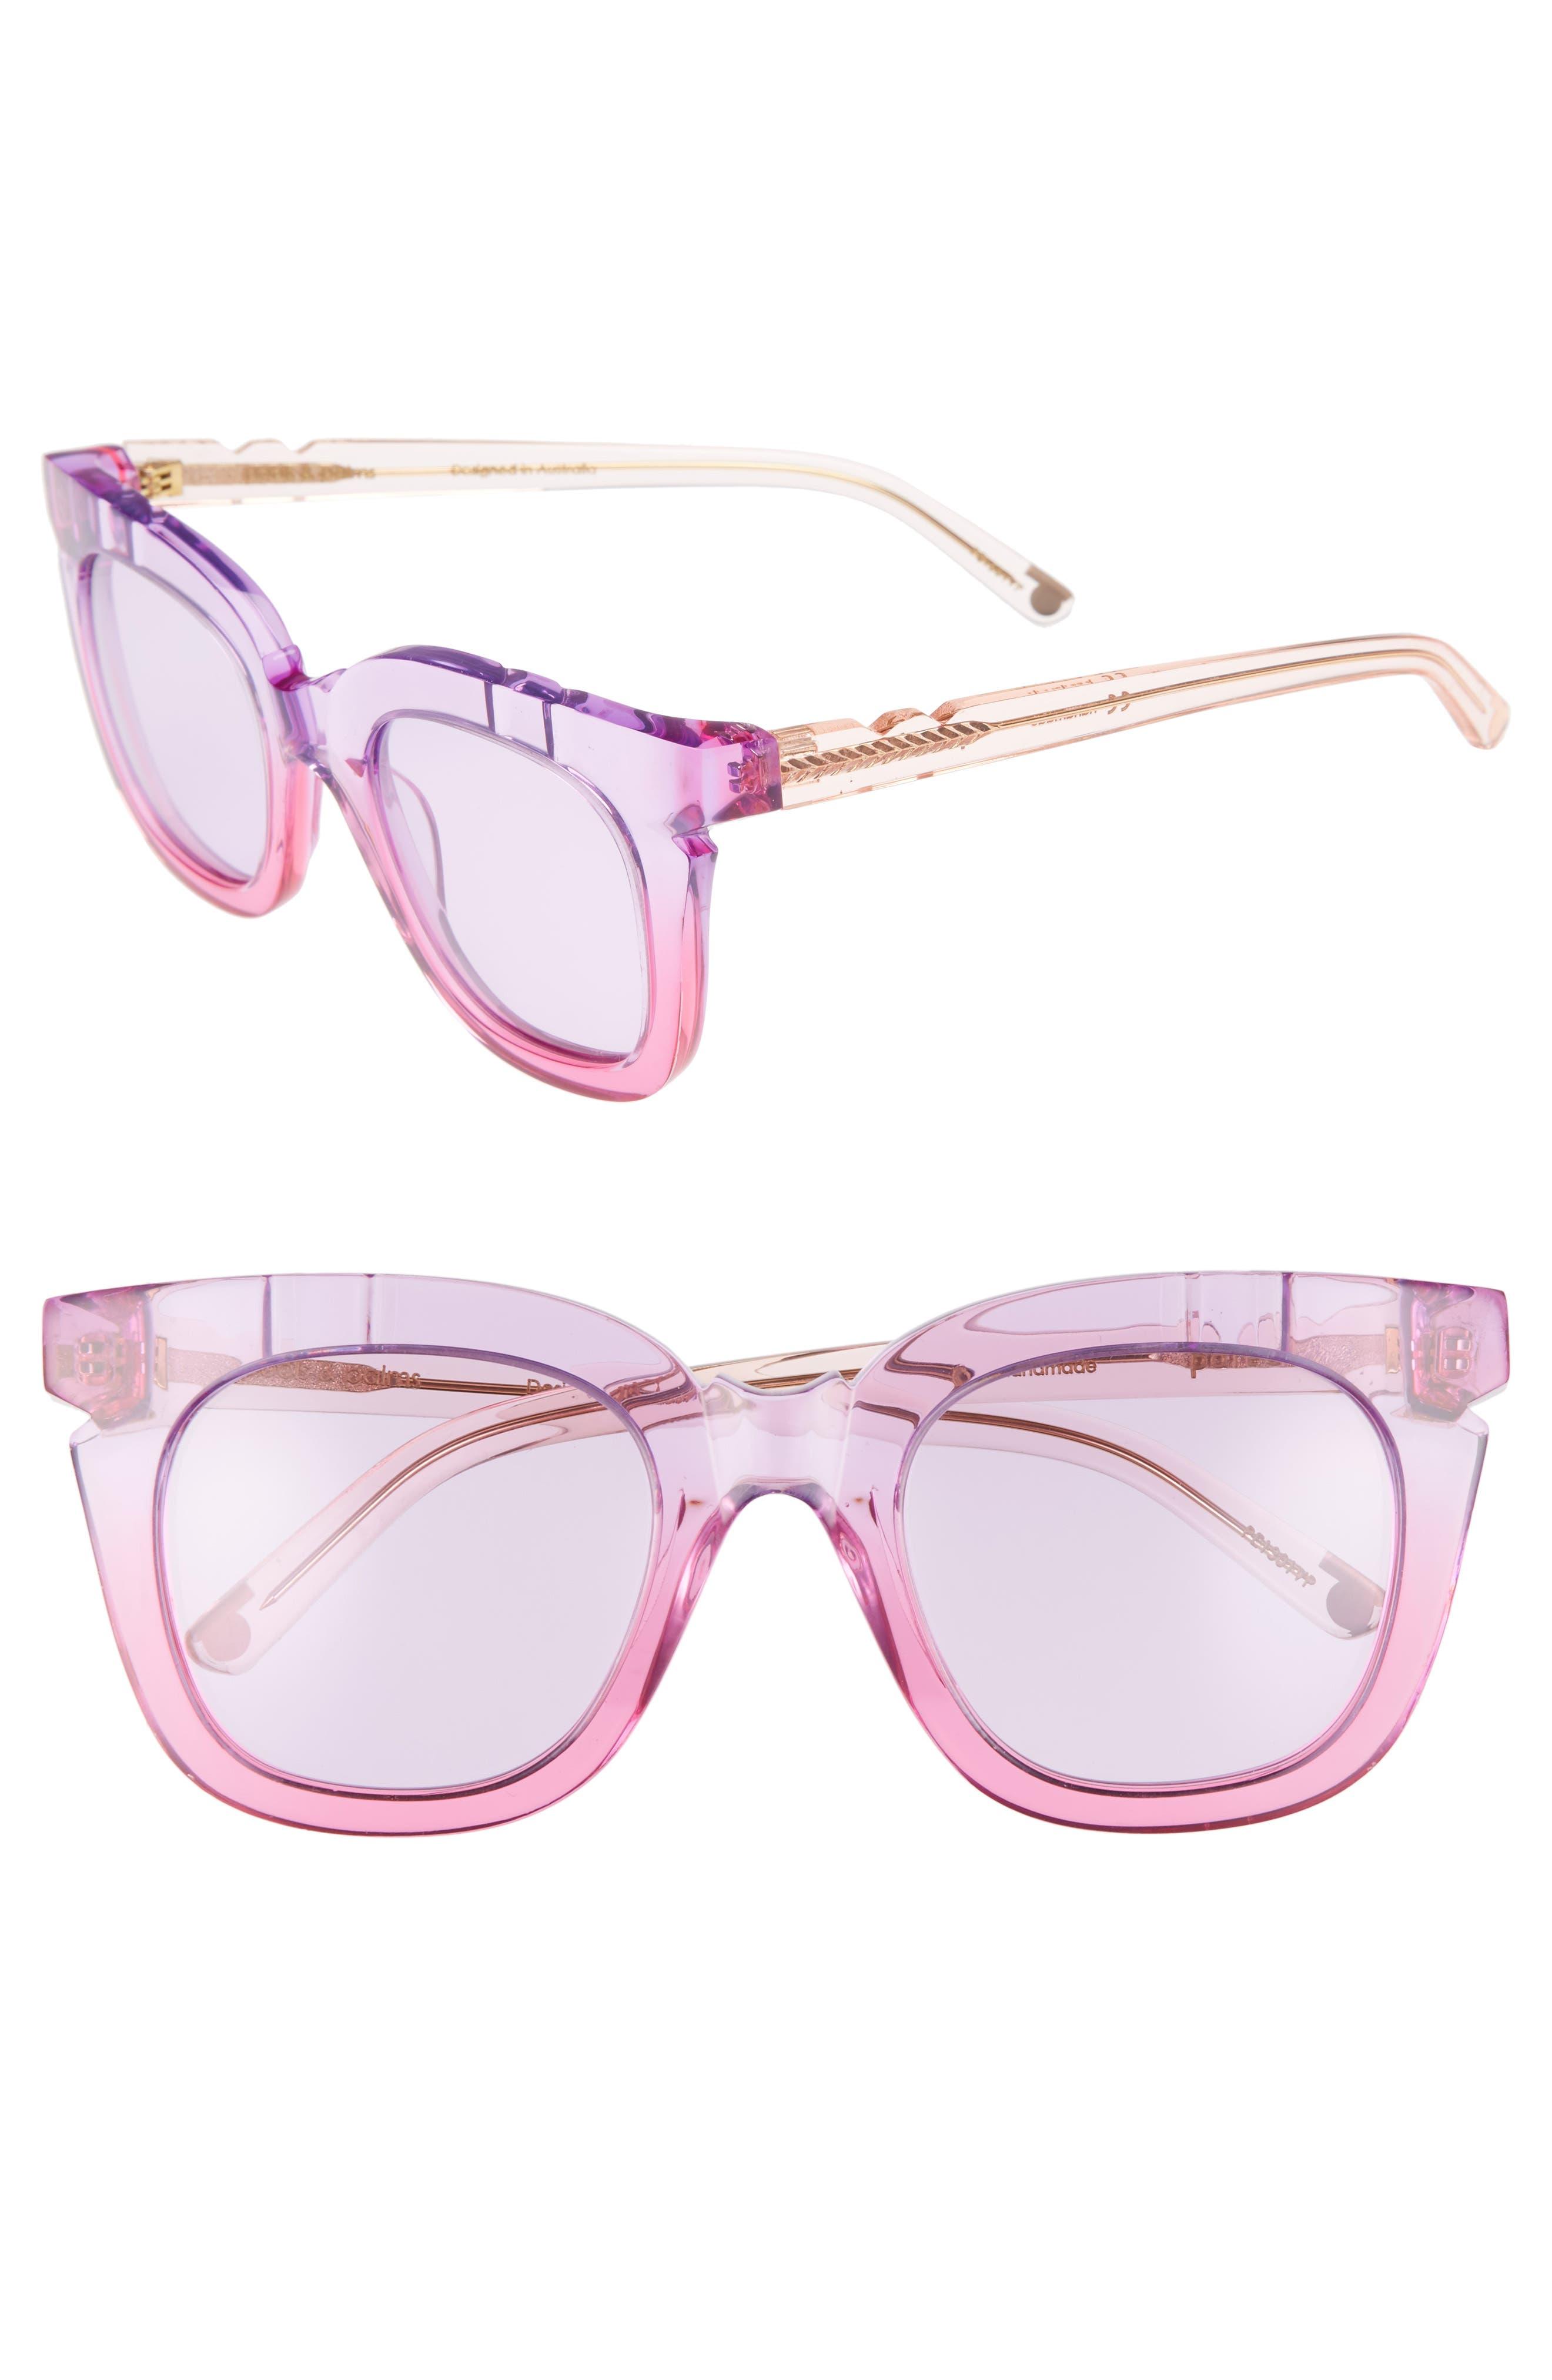 Pools & Palms 50mm Sunglasses,                         Main,                         color, Fruit Tingle Acetate/ Violet